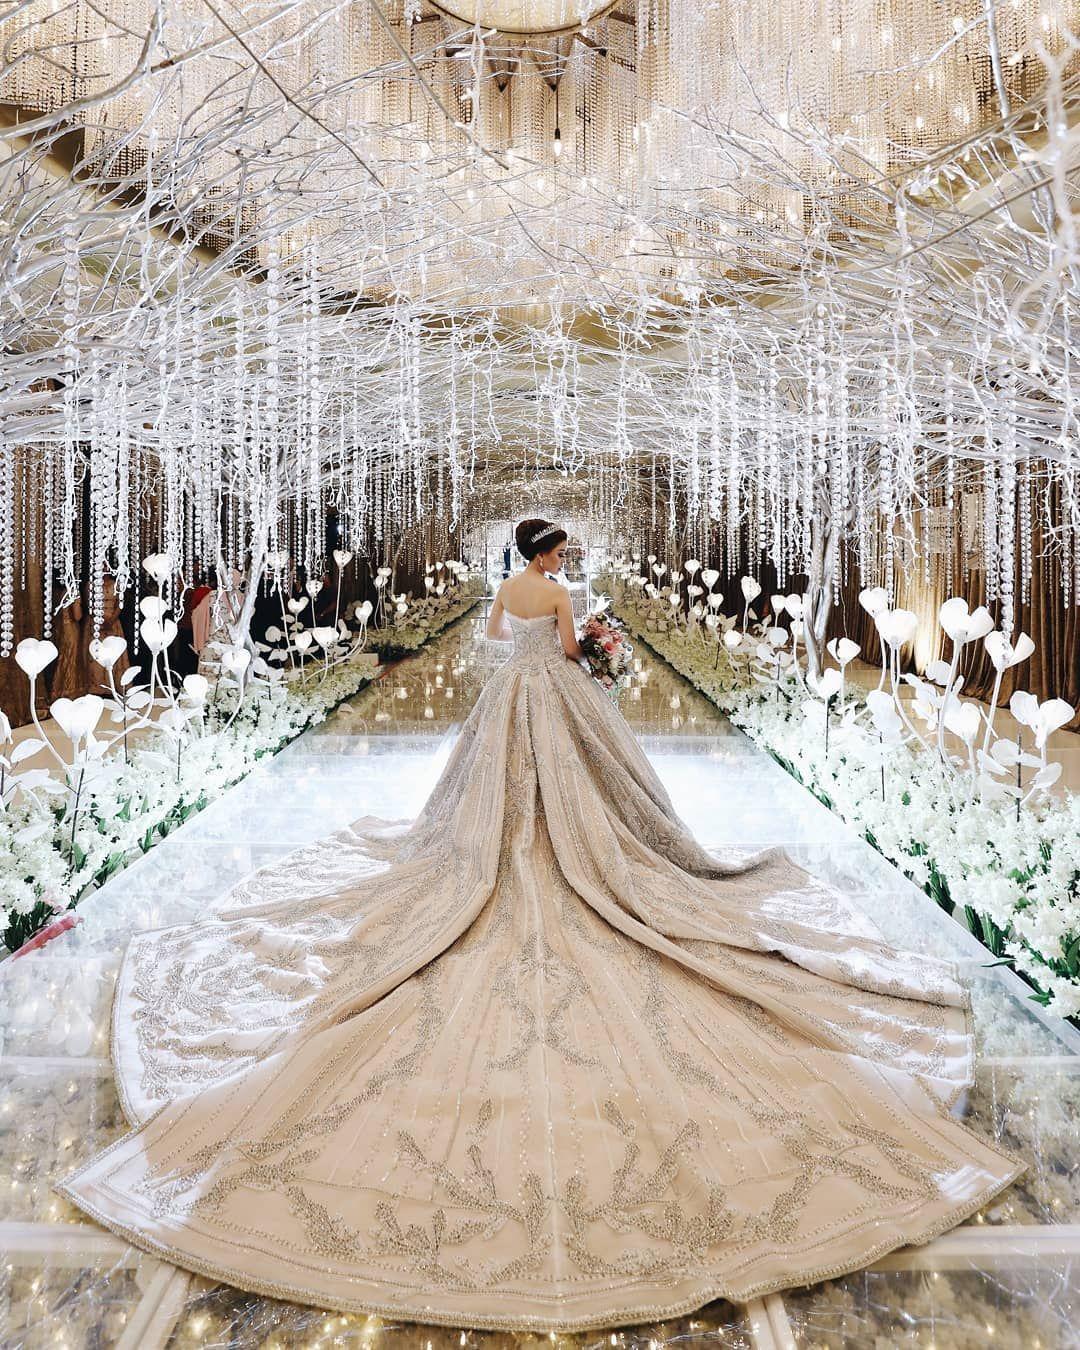 Happily Ever After Starts Here Courtesy Of Ryando Felicia Feliciagiovanni Ryando Alternative Wedding Dresses Wedding Dresses Wedding Dress Alterations [ 1350 x 1080 Pixel ]